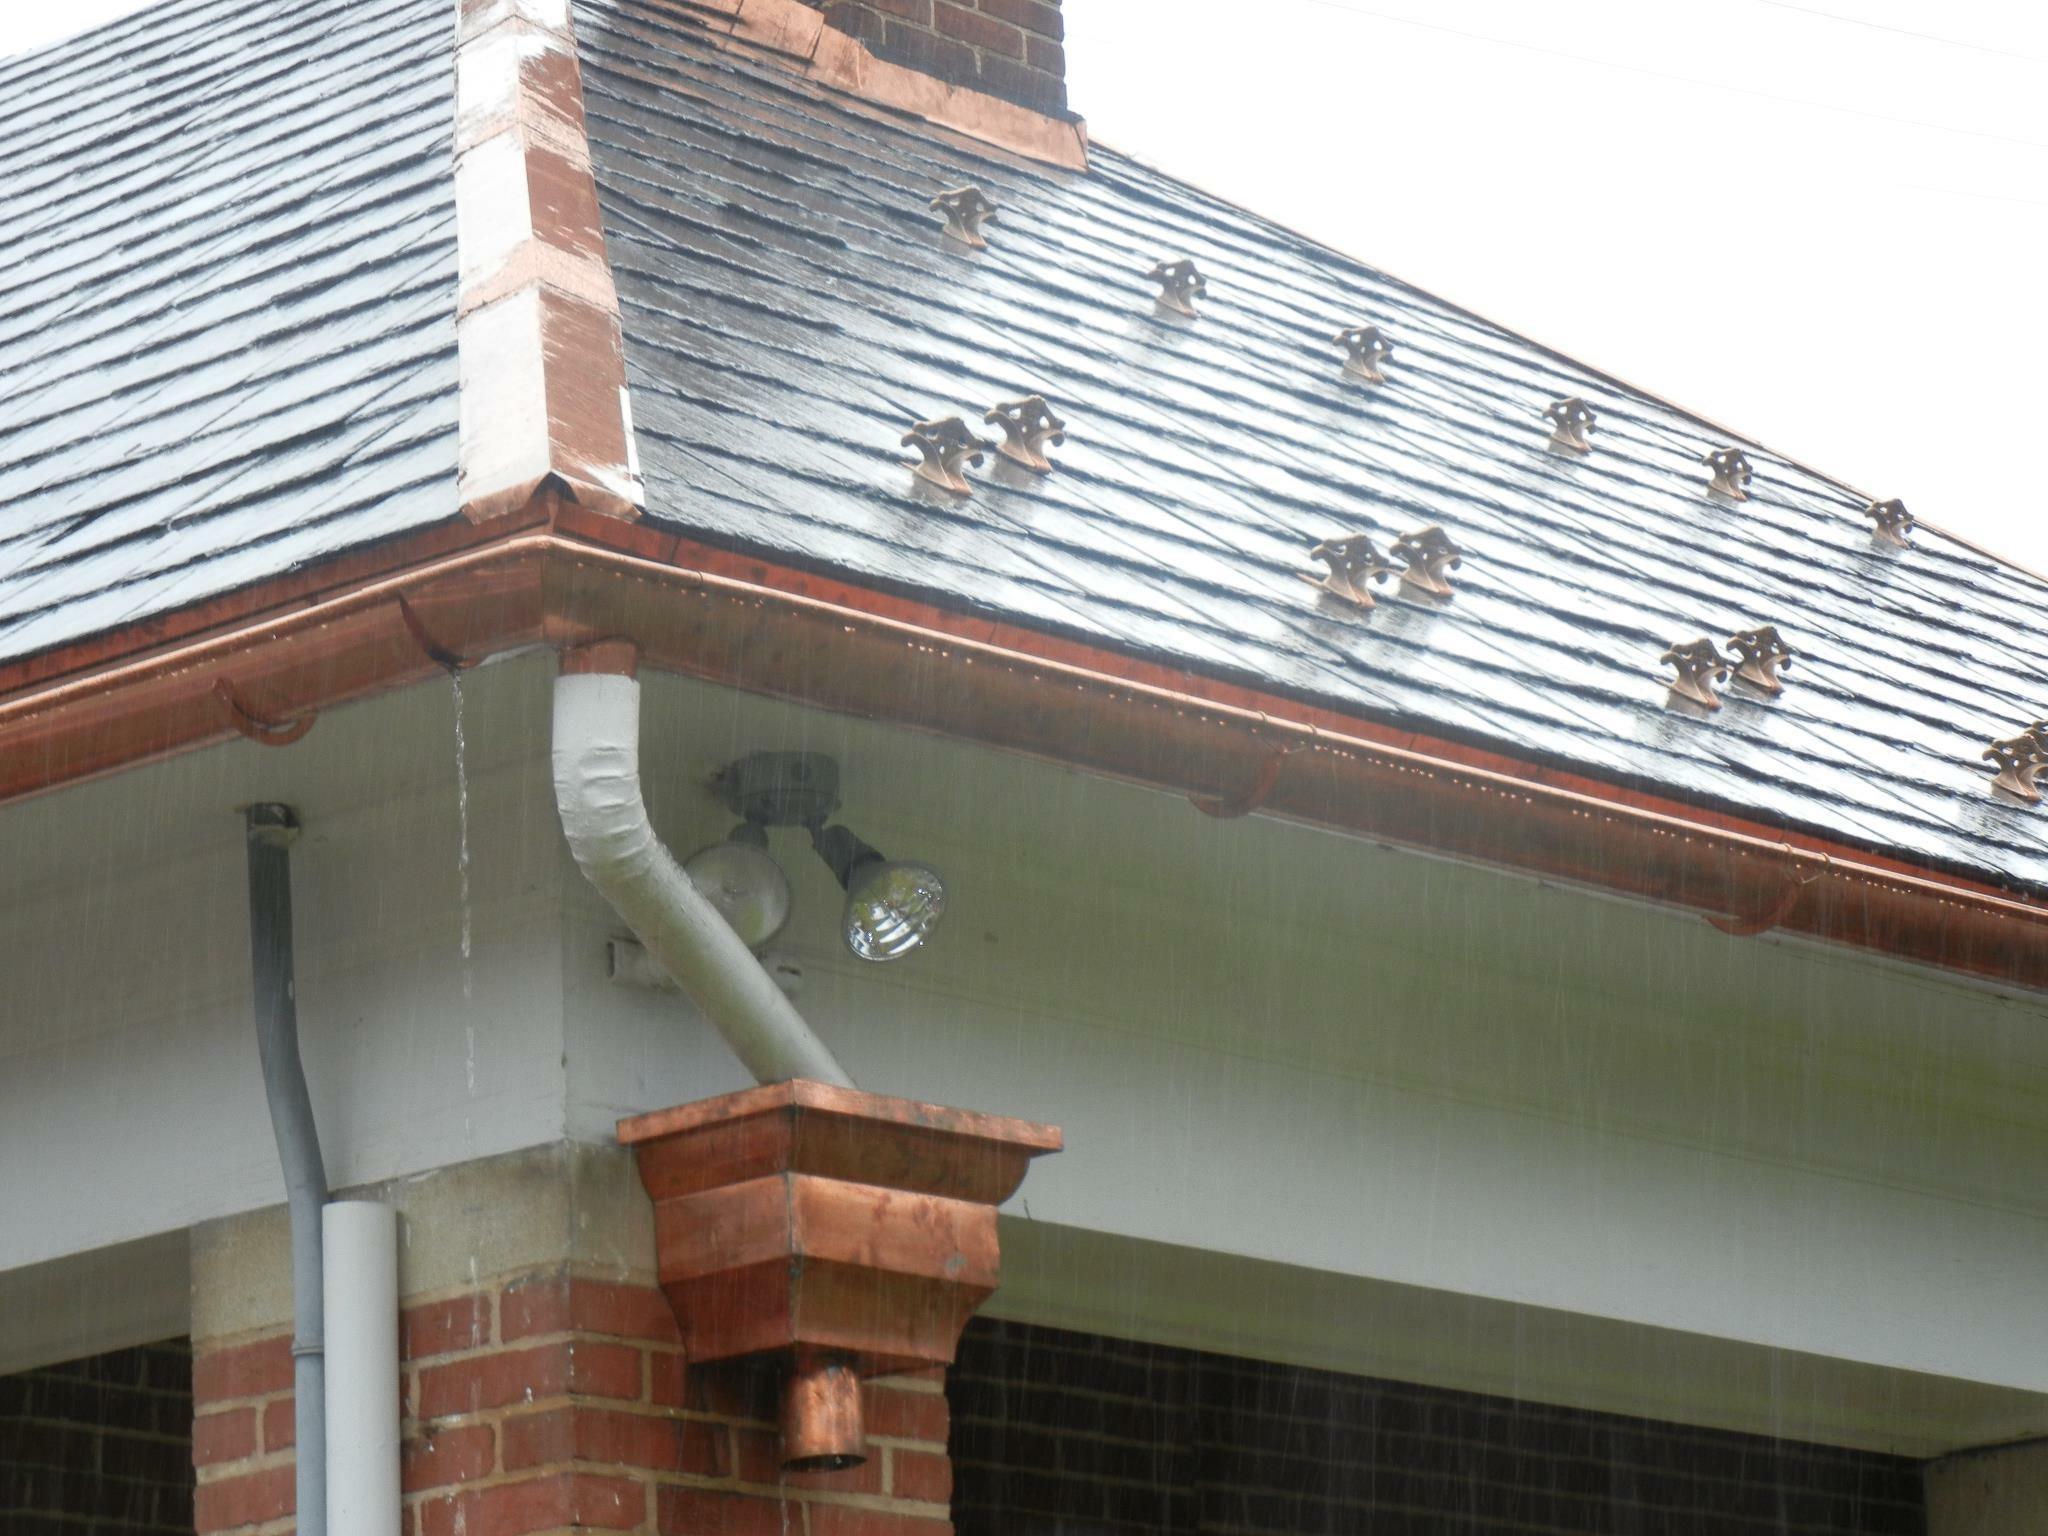 Joey Wildasin Slate Roofing image 7